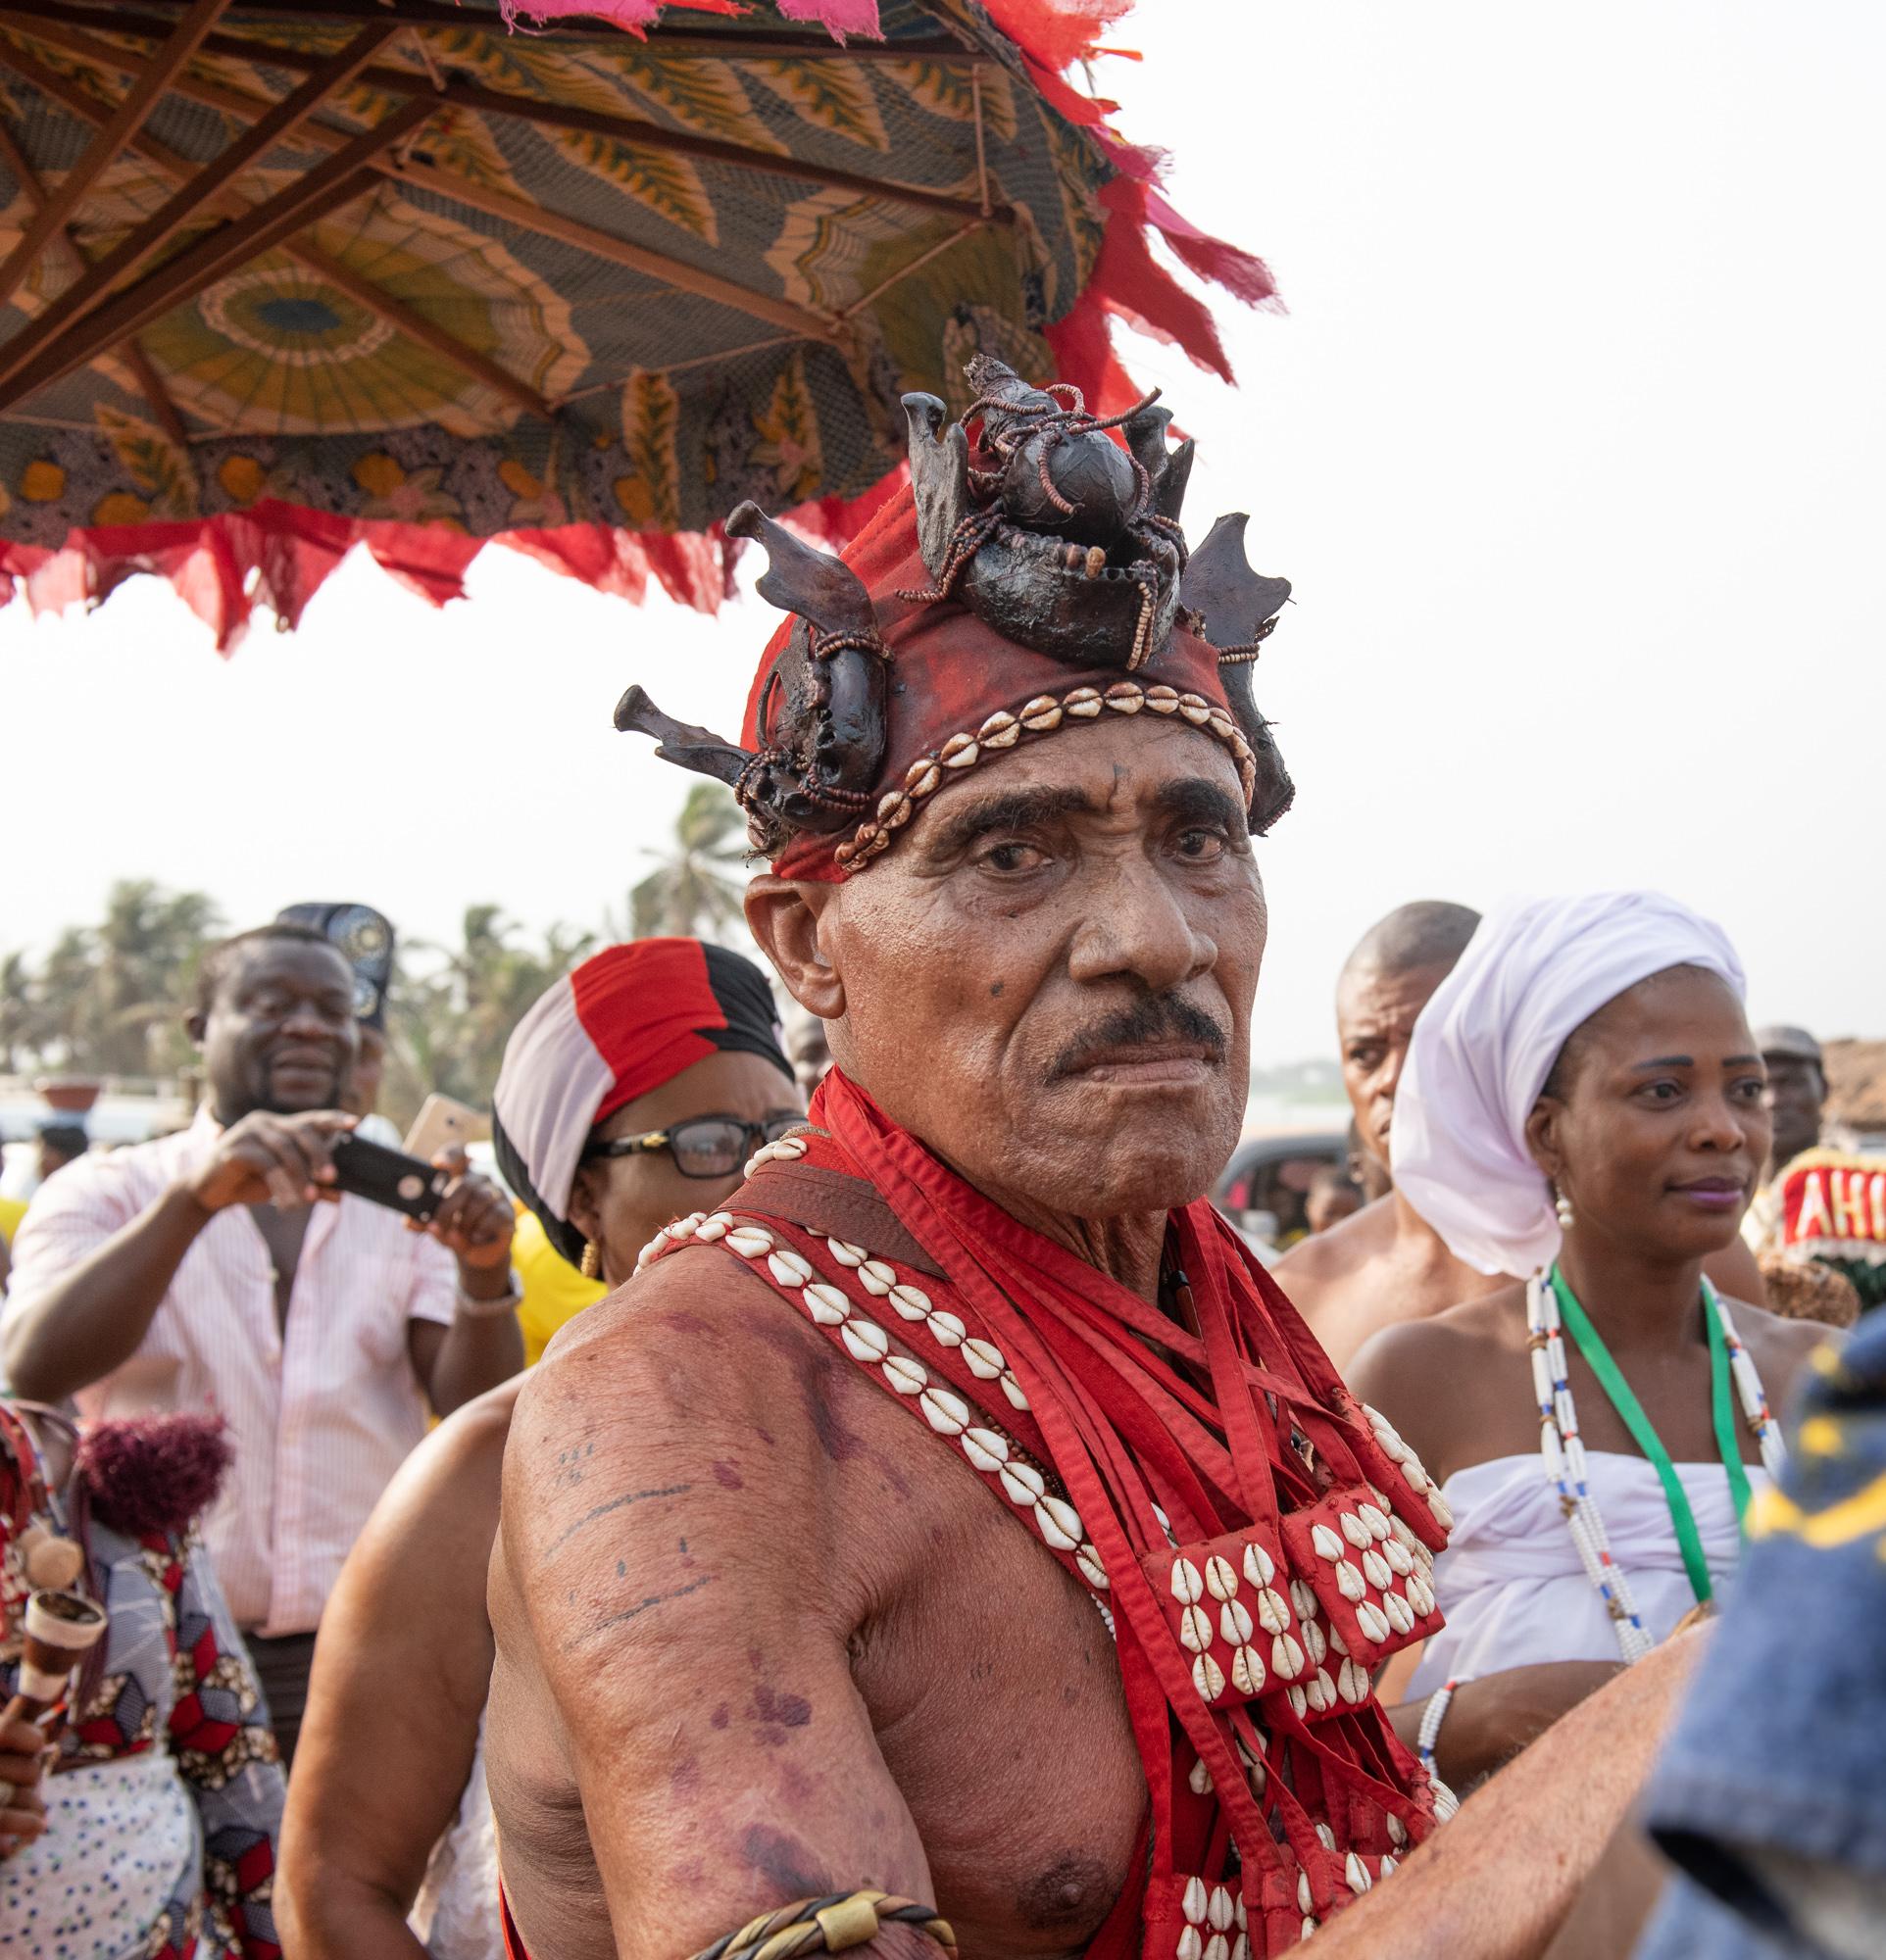 Village Chief. 2019 Voodoo Festival, Ouidah, Benin